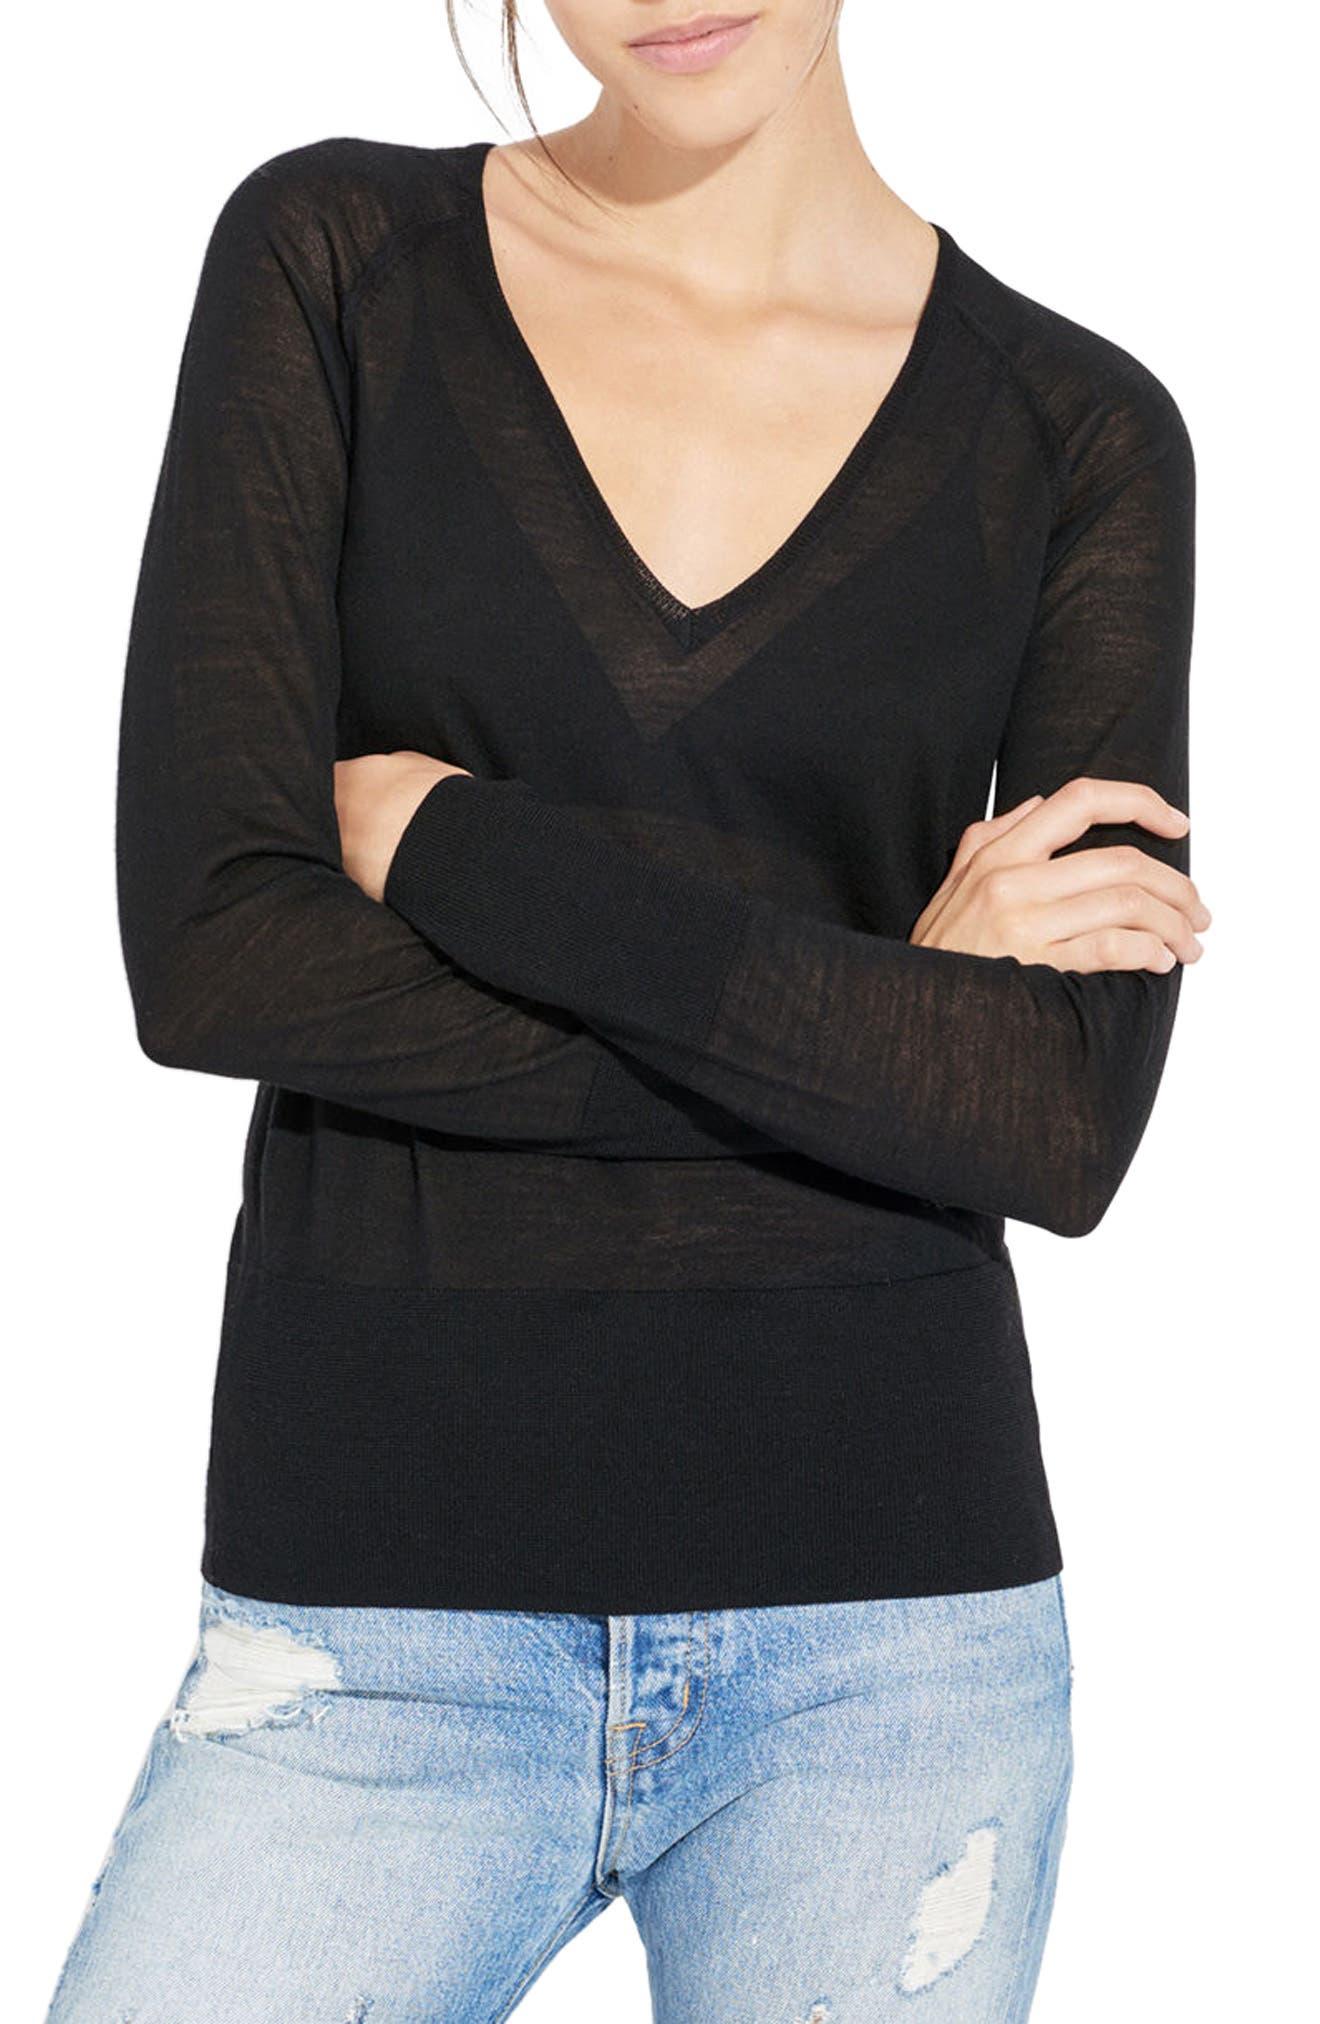 Alternate Image 1 Selected - AYR The Slice Merino Wool Sweater